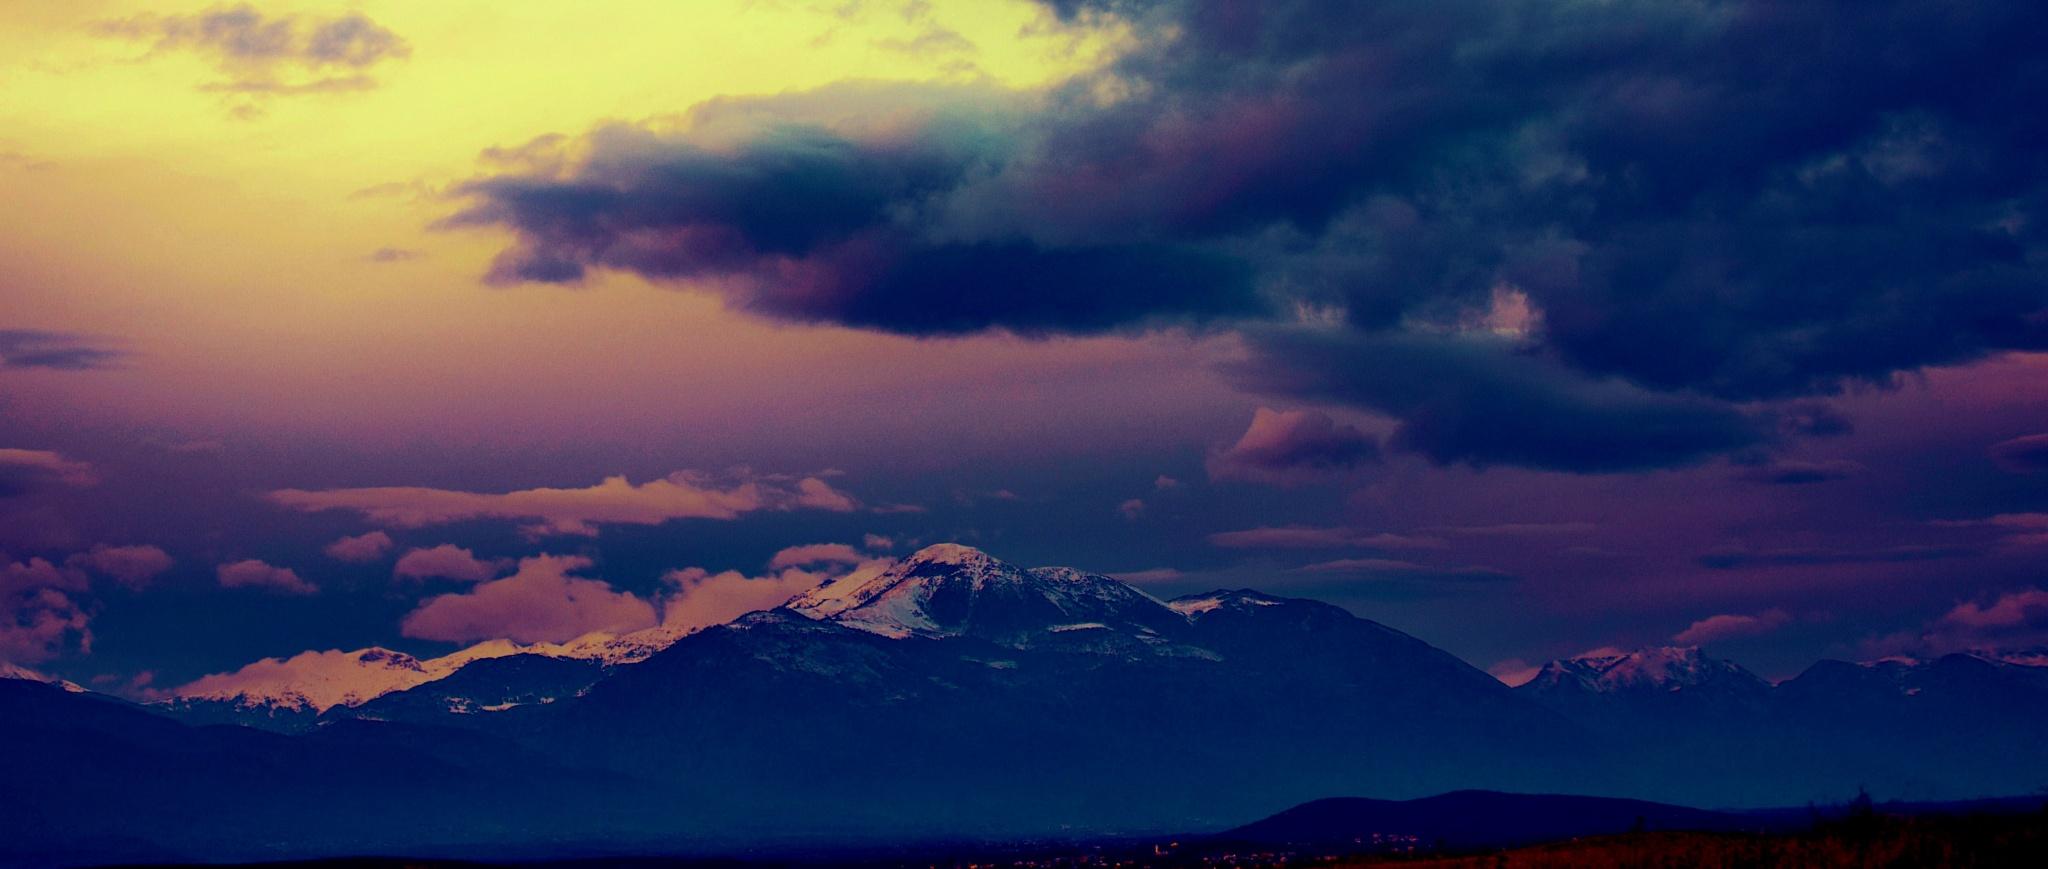 WINTER by petrit.grezda